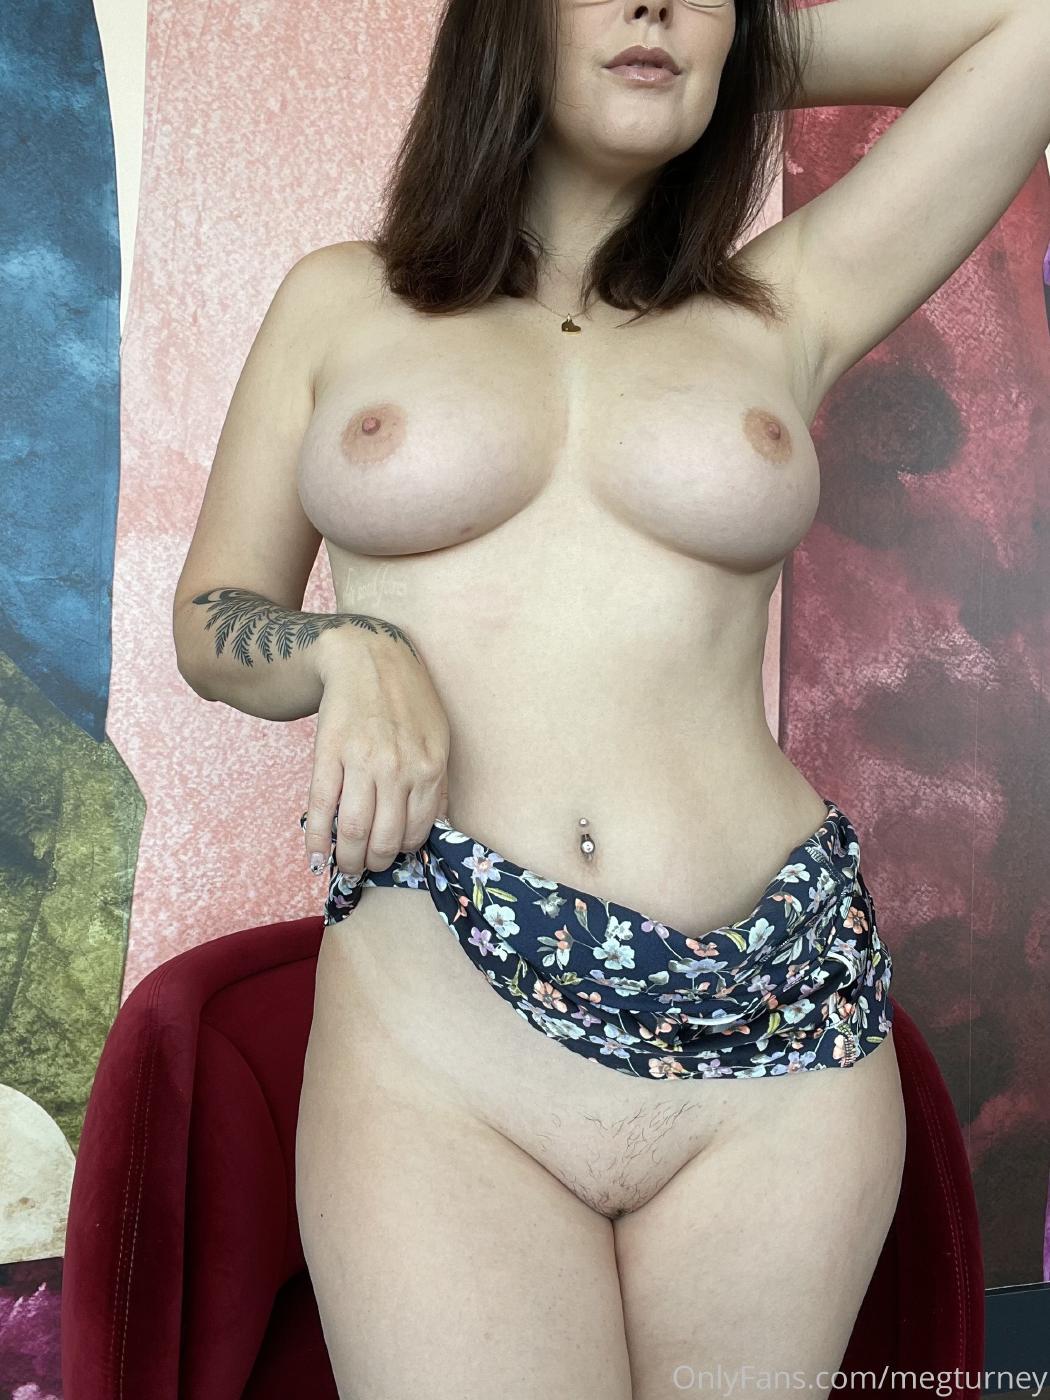 Meg Turney Unshaven Pussy Candids Onlyfans Set Leaked Mvxonu